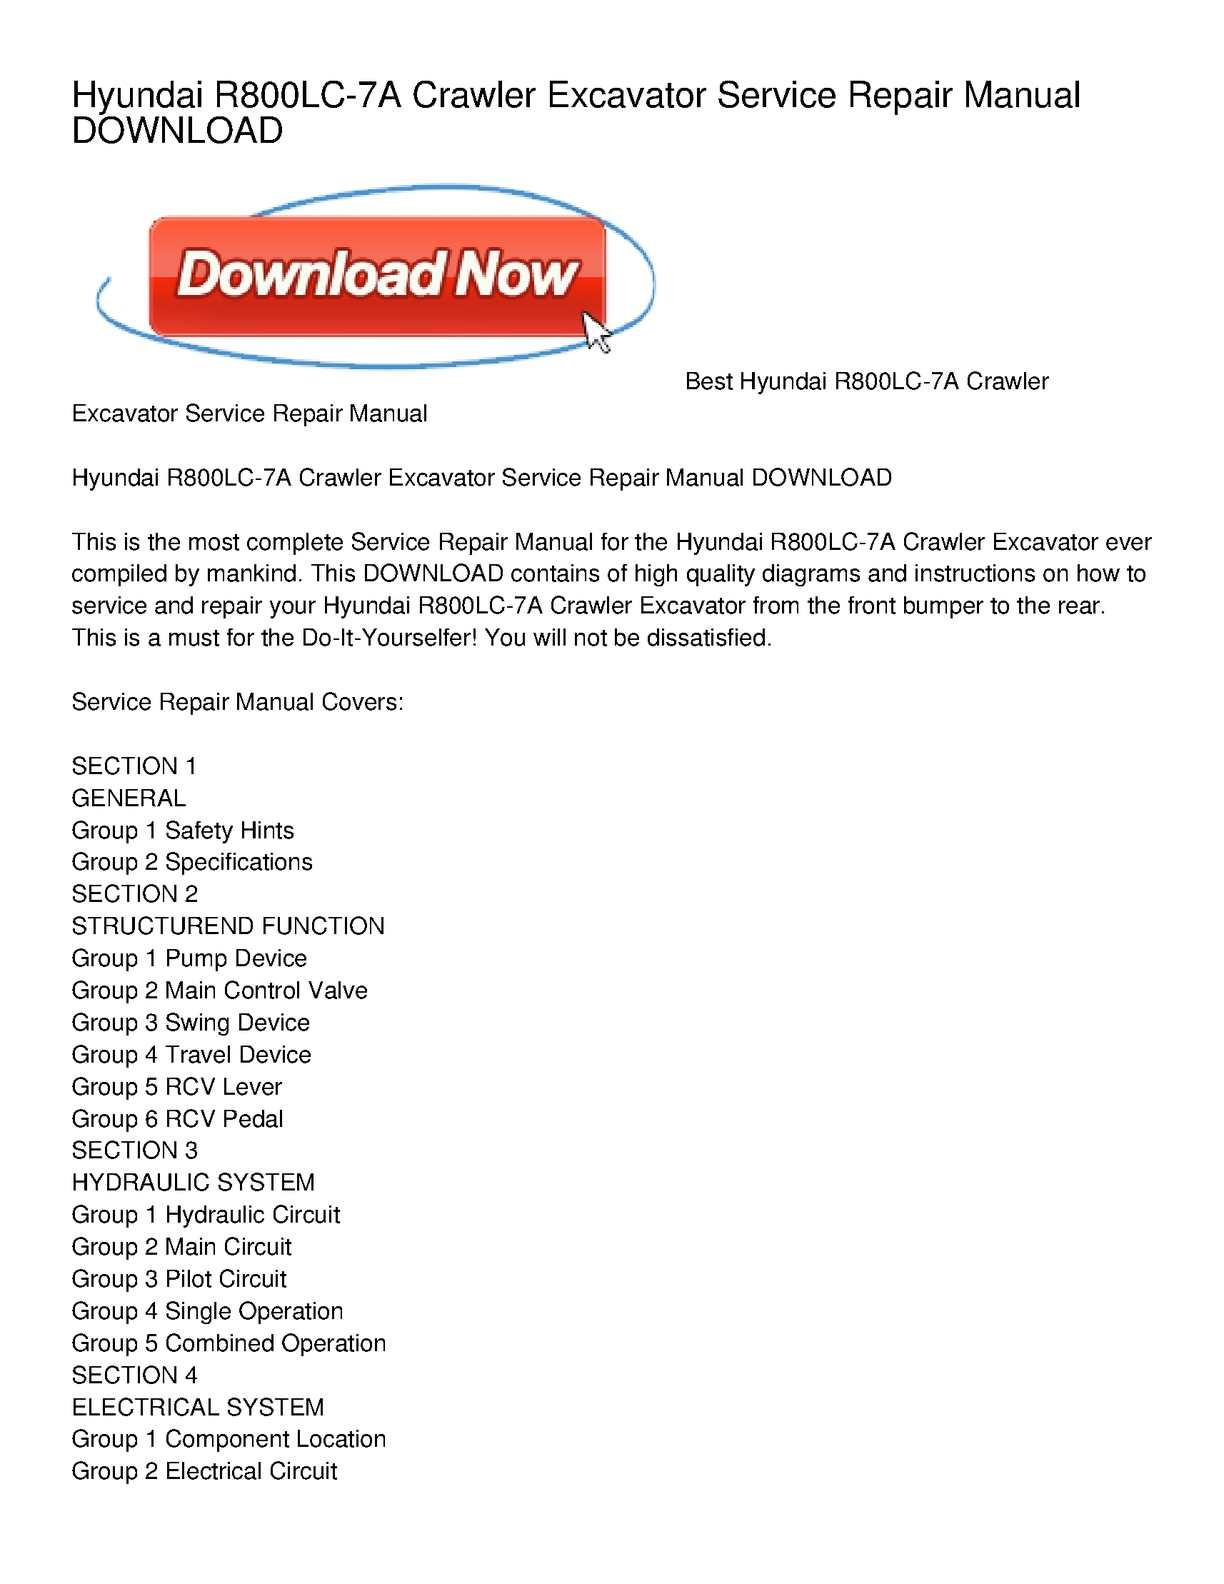 Calaméo - Hyundai R800LC-7A Crawler Excavator Service Repair Manual DOWNLOAD